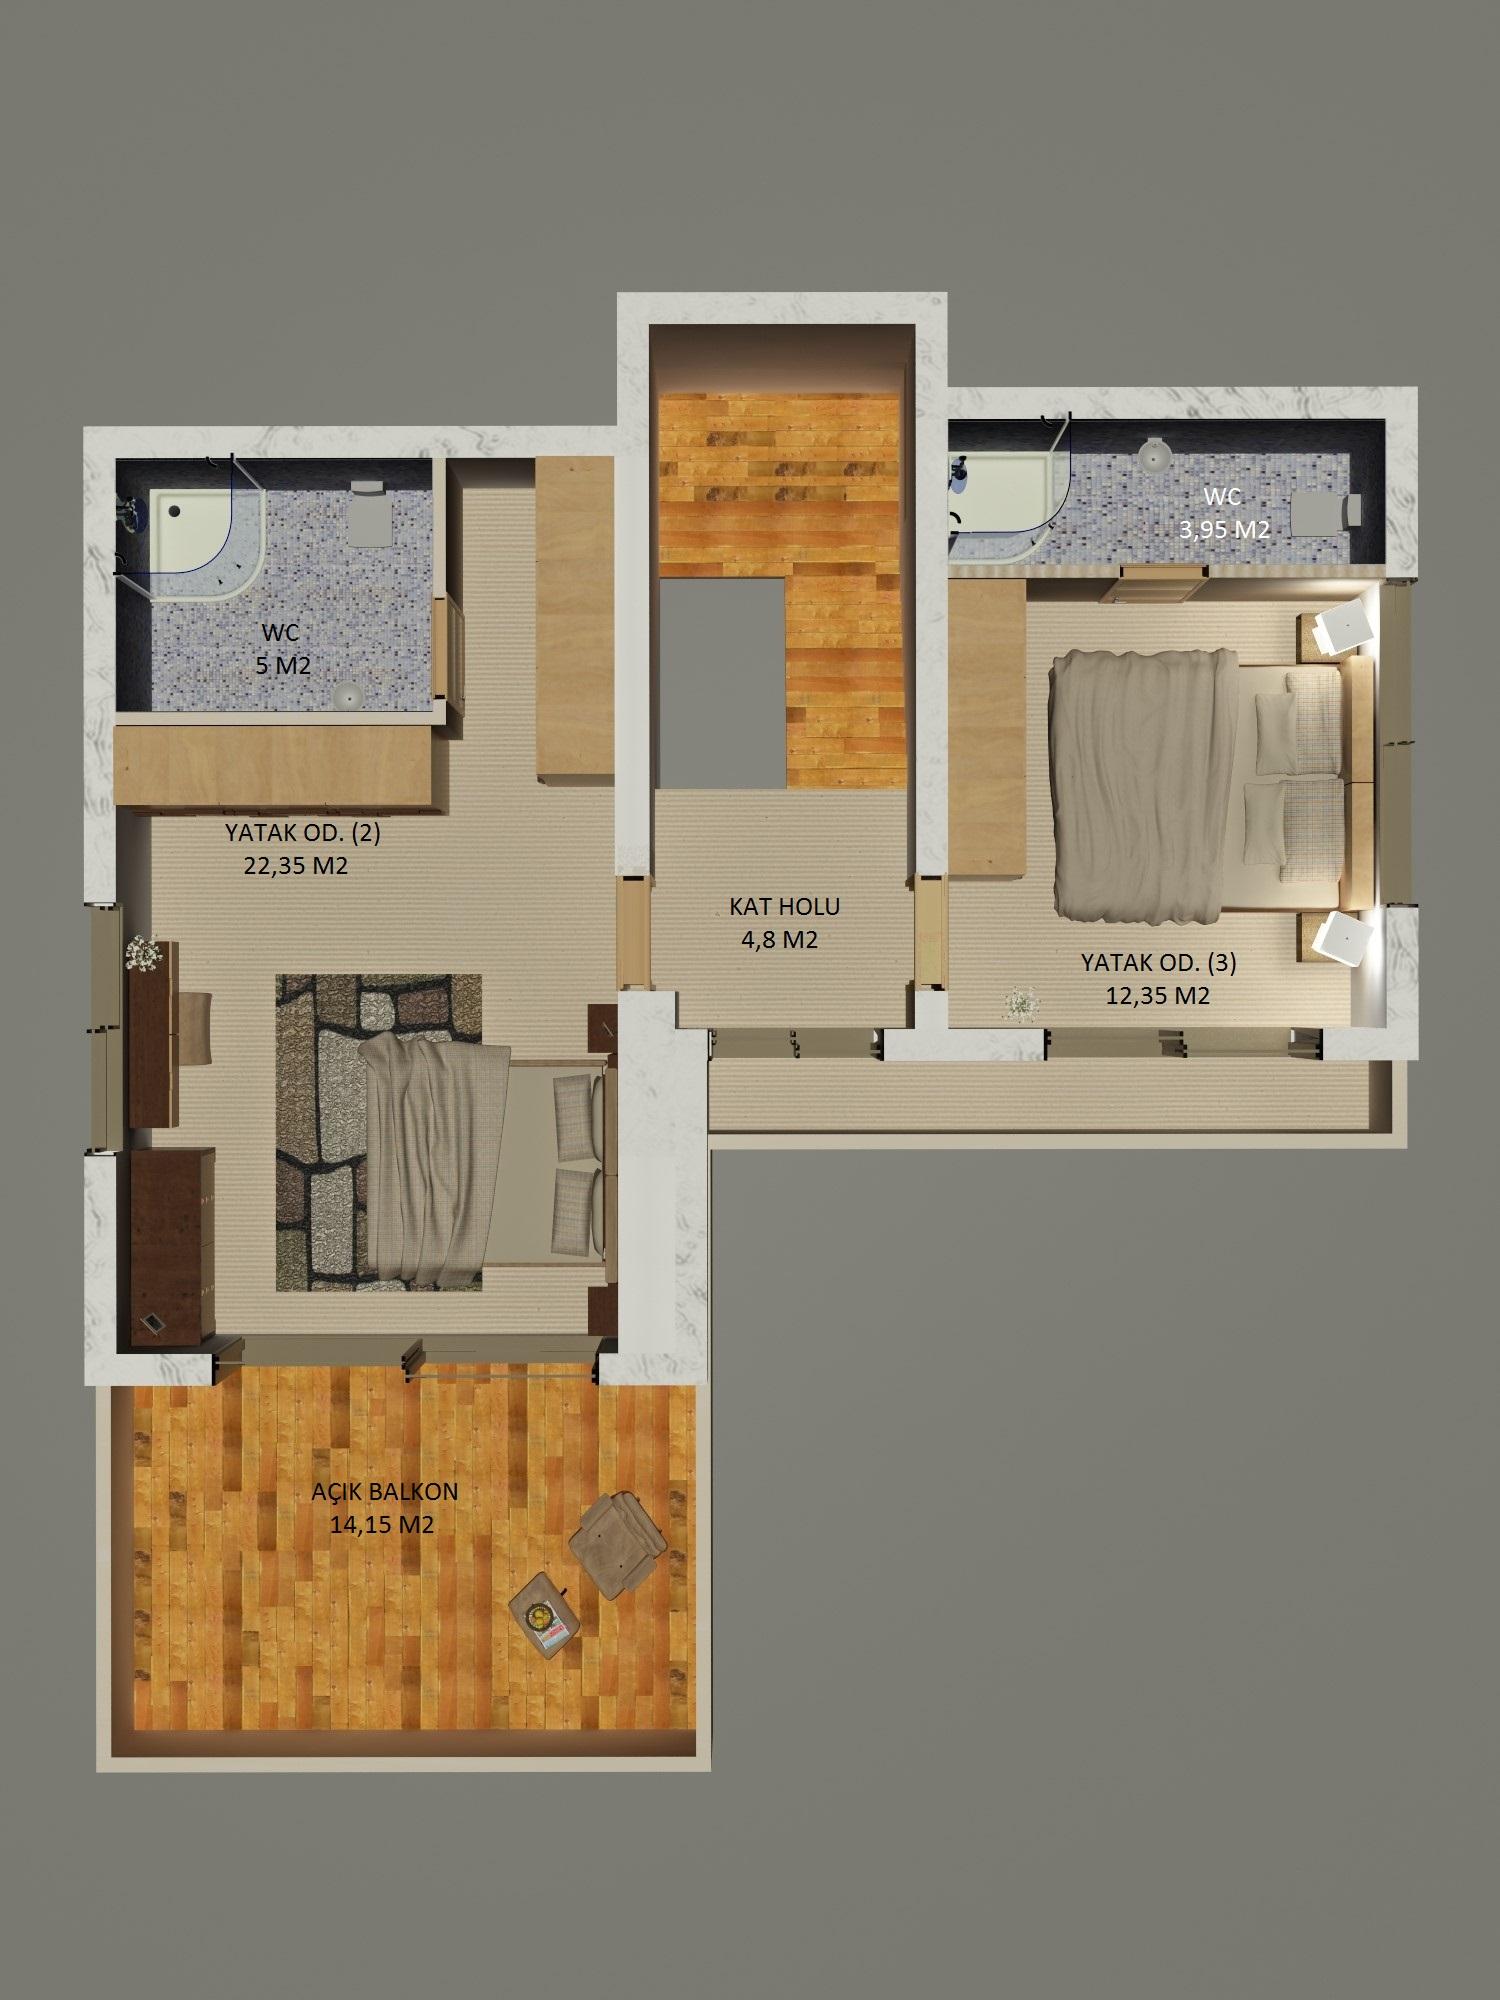 Catalkoy Modern Villa Floor Plan 8 Top Result 50 New 7 Bedroom House Plans Gallery 2017 Hgd6